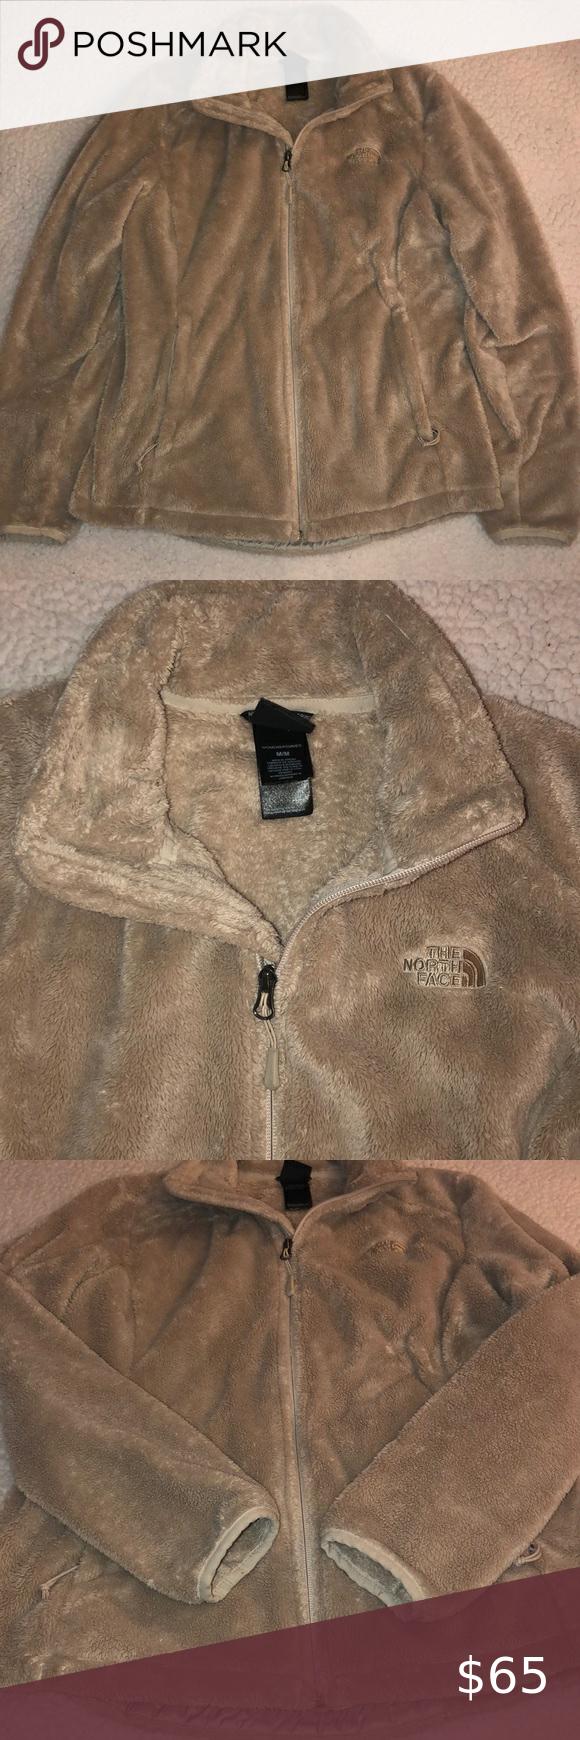 Tan Color North Face North Face Hyvent Jacket Coats Jackets Women North Face Coat [ 1740 x 580 Pixel ]